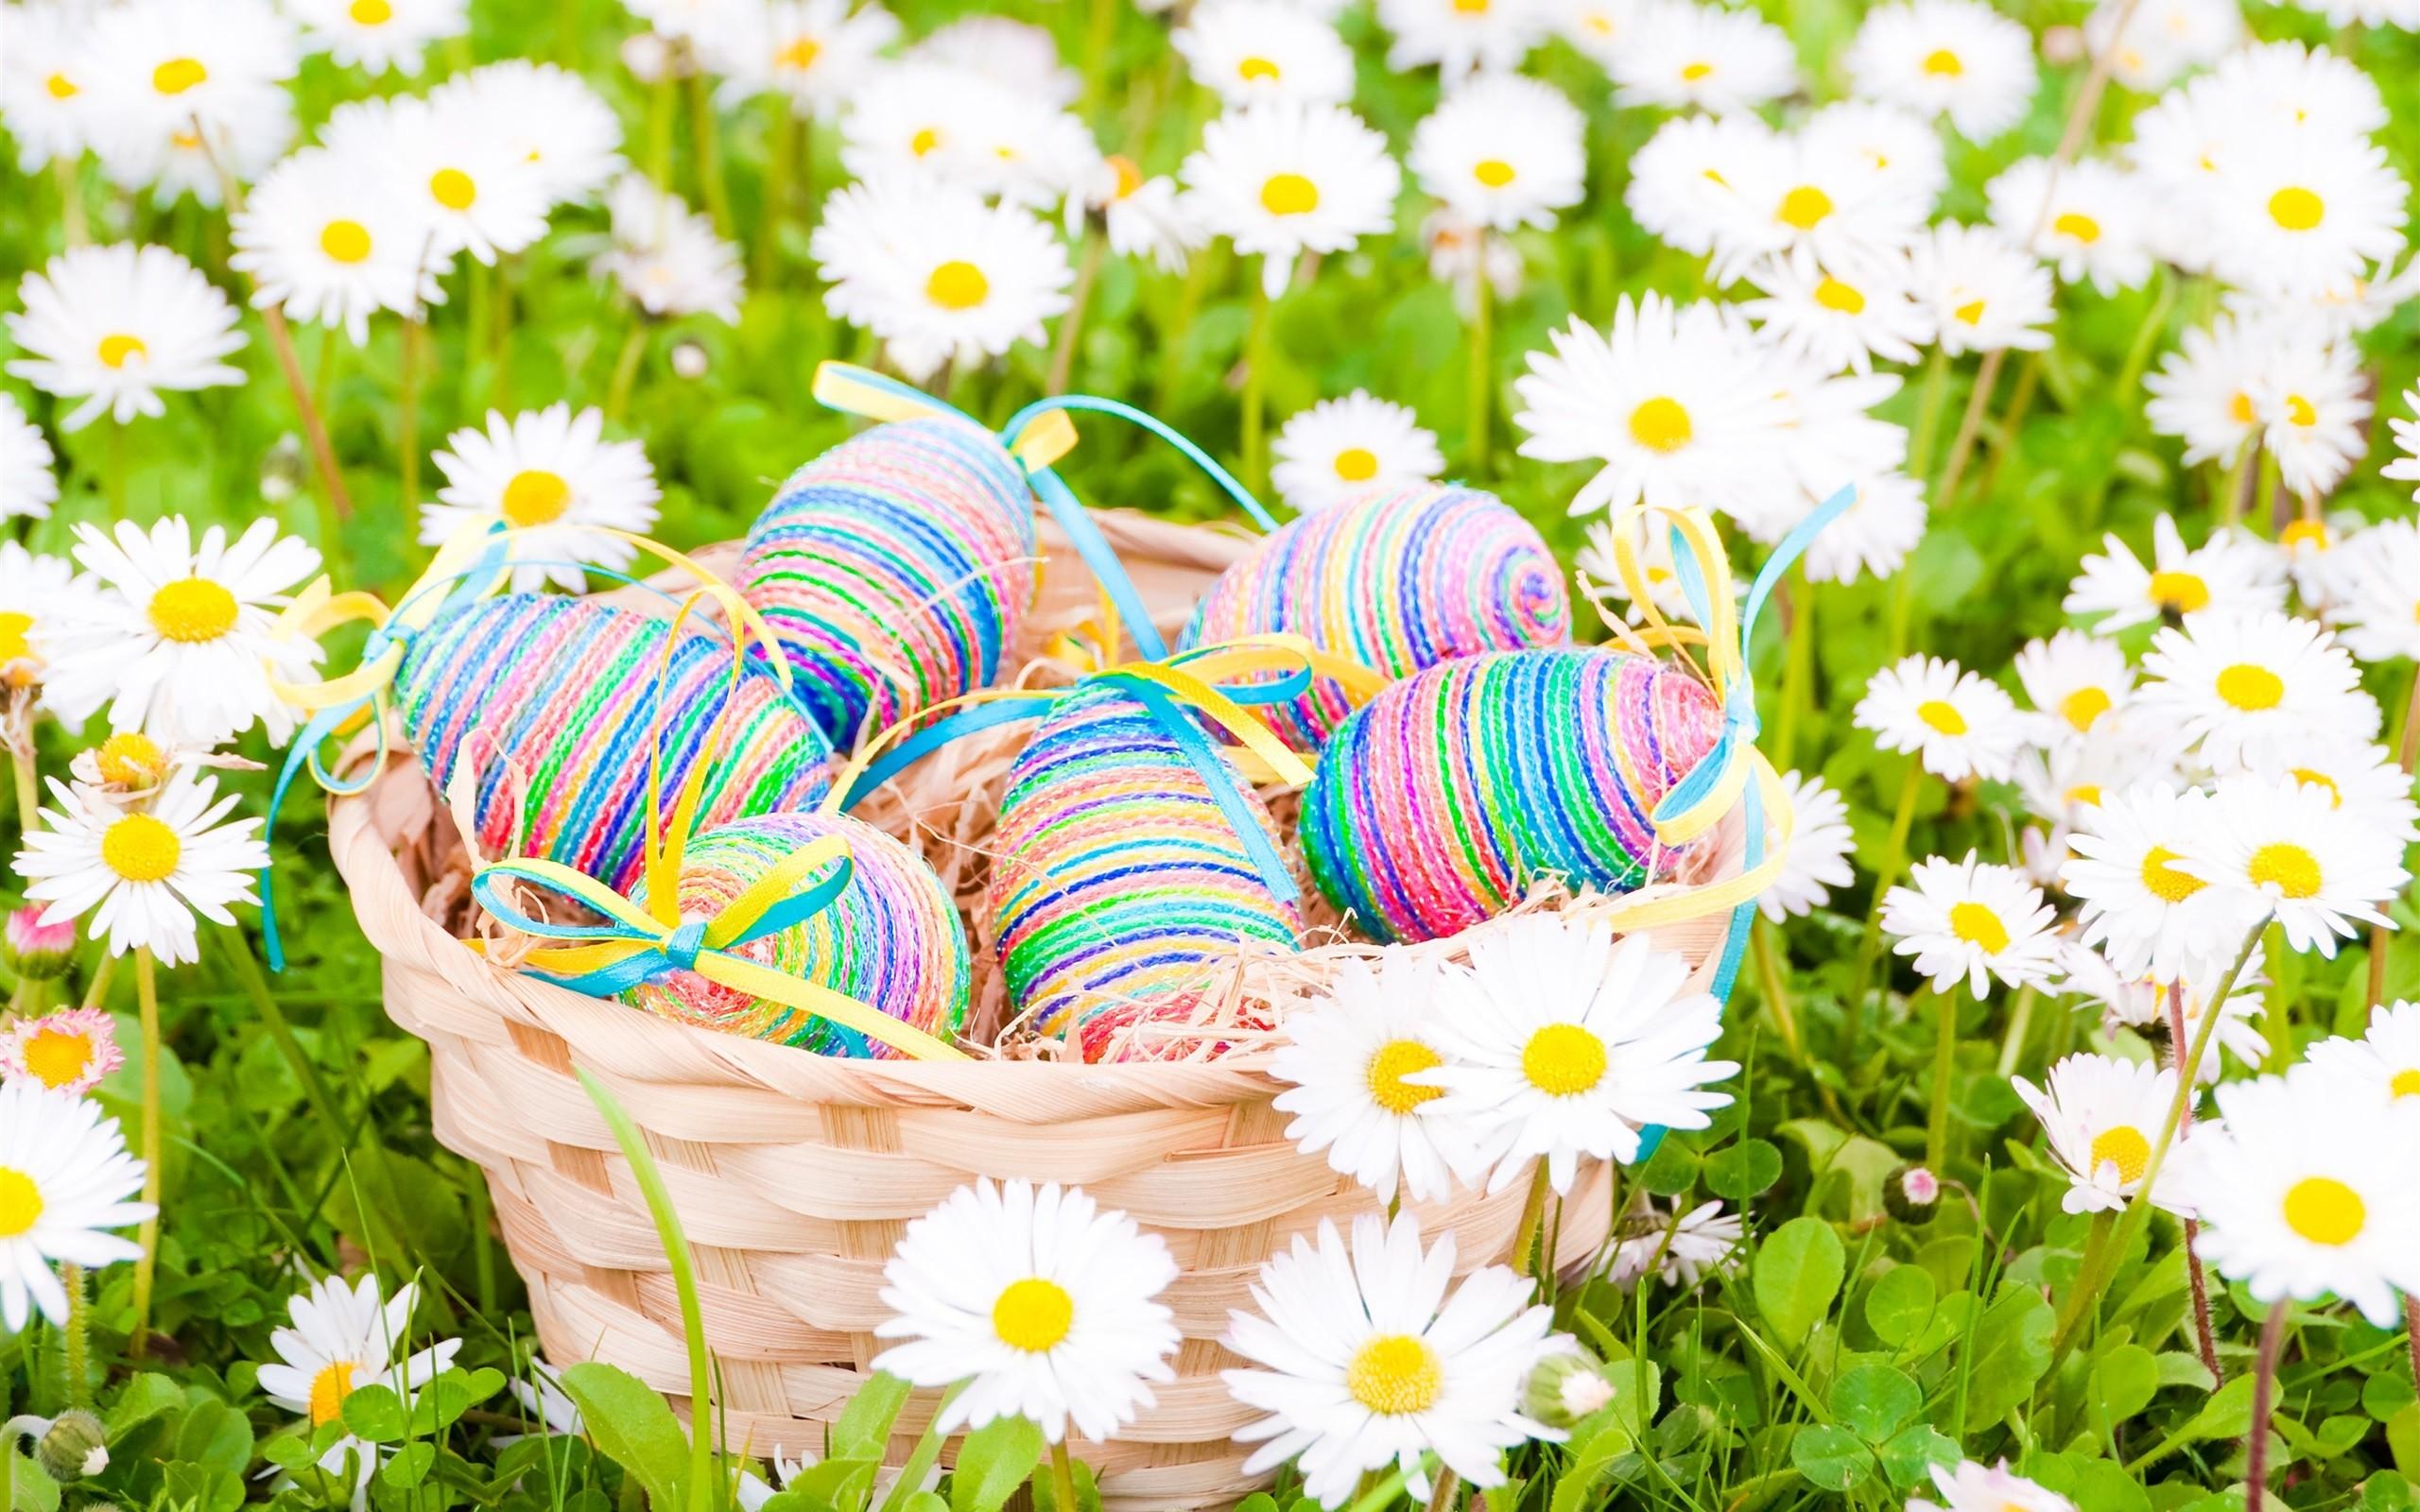 Easter, eggs, daisies, white flowers, spring wallpaper thumb